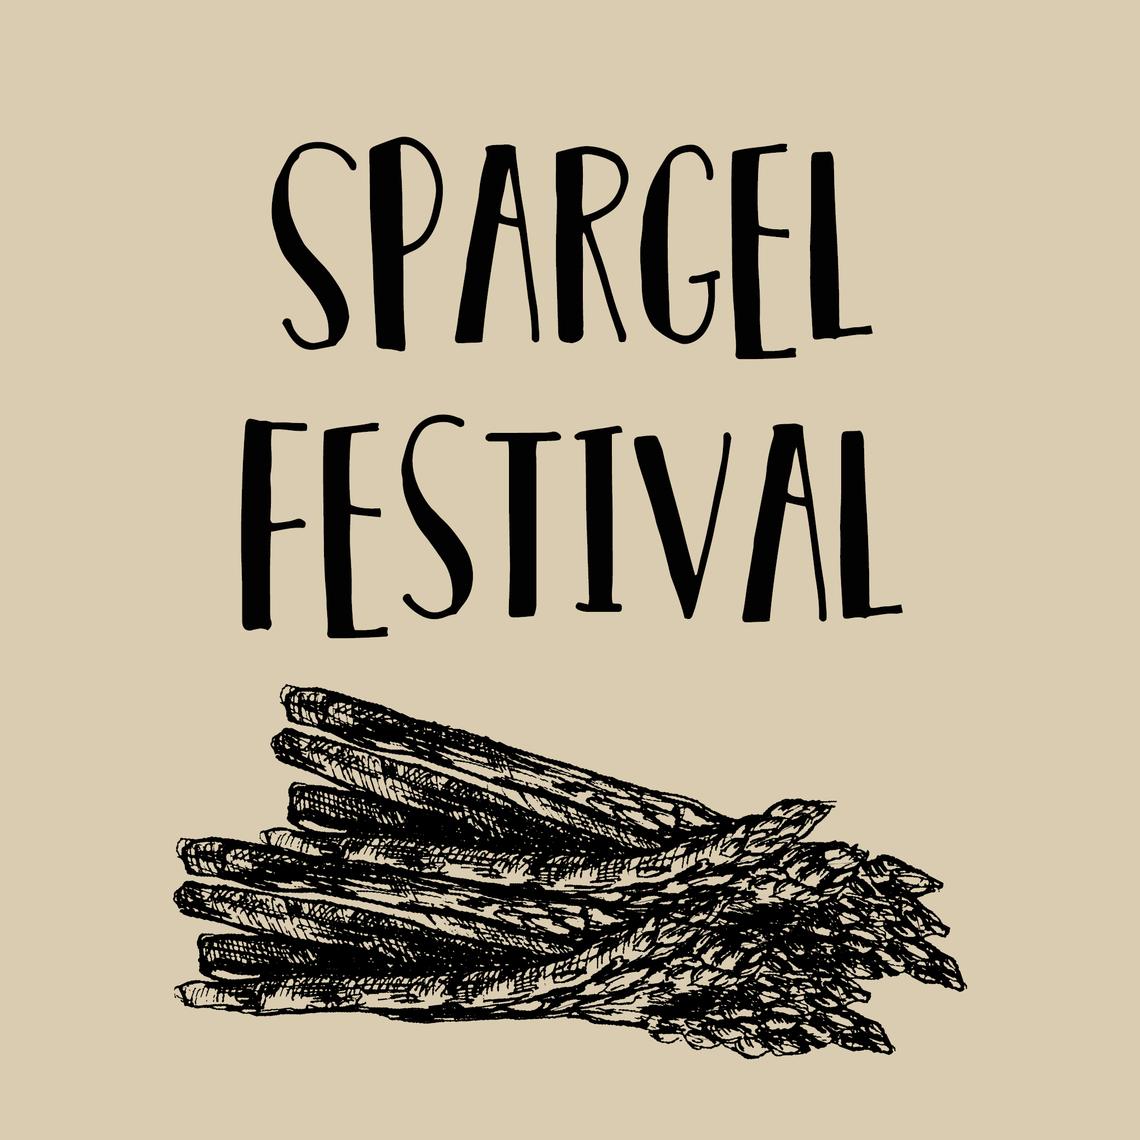 Spargel Festival